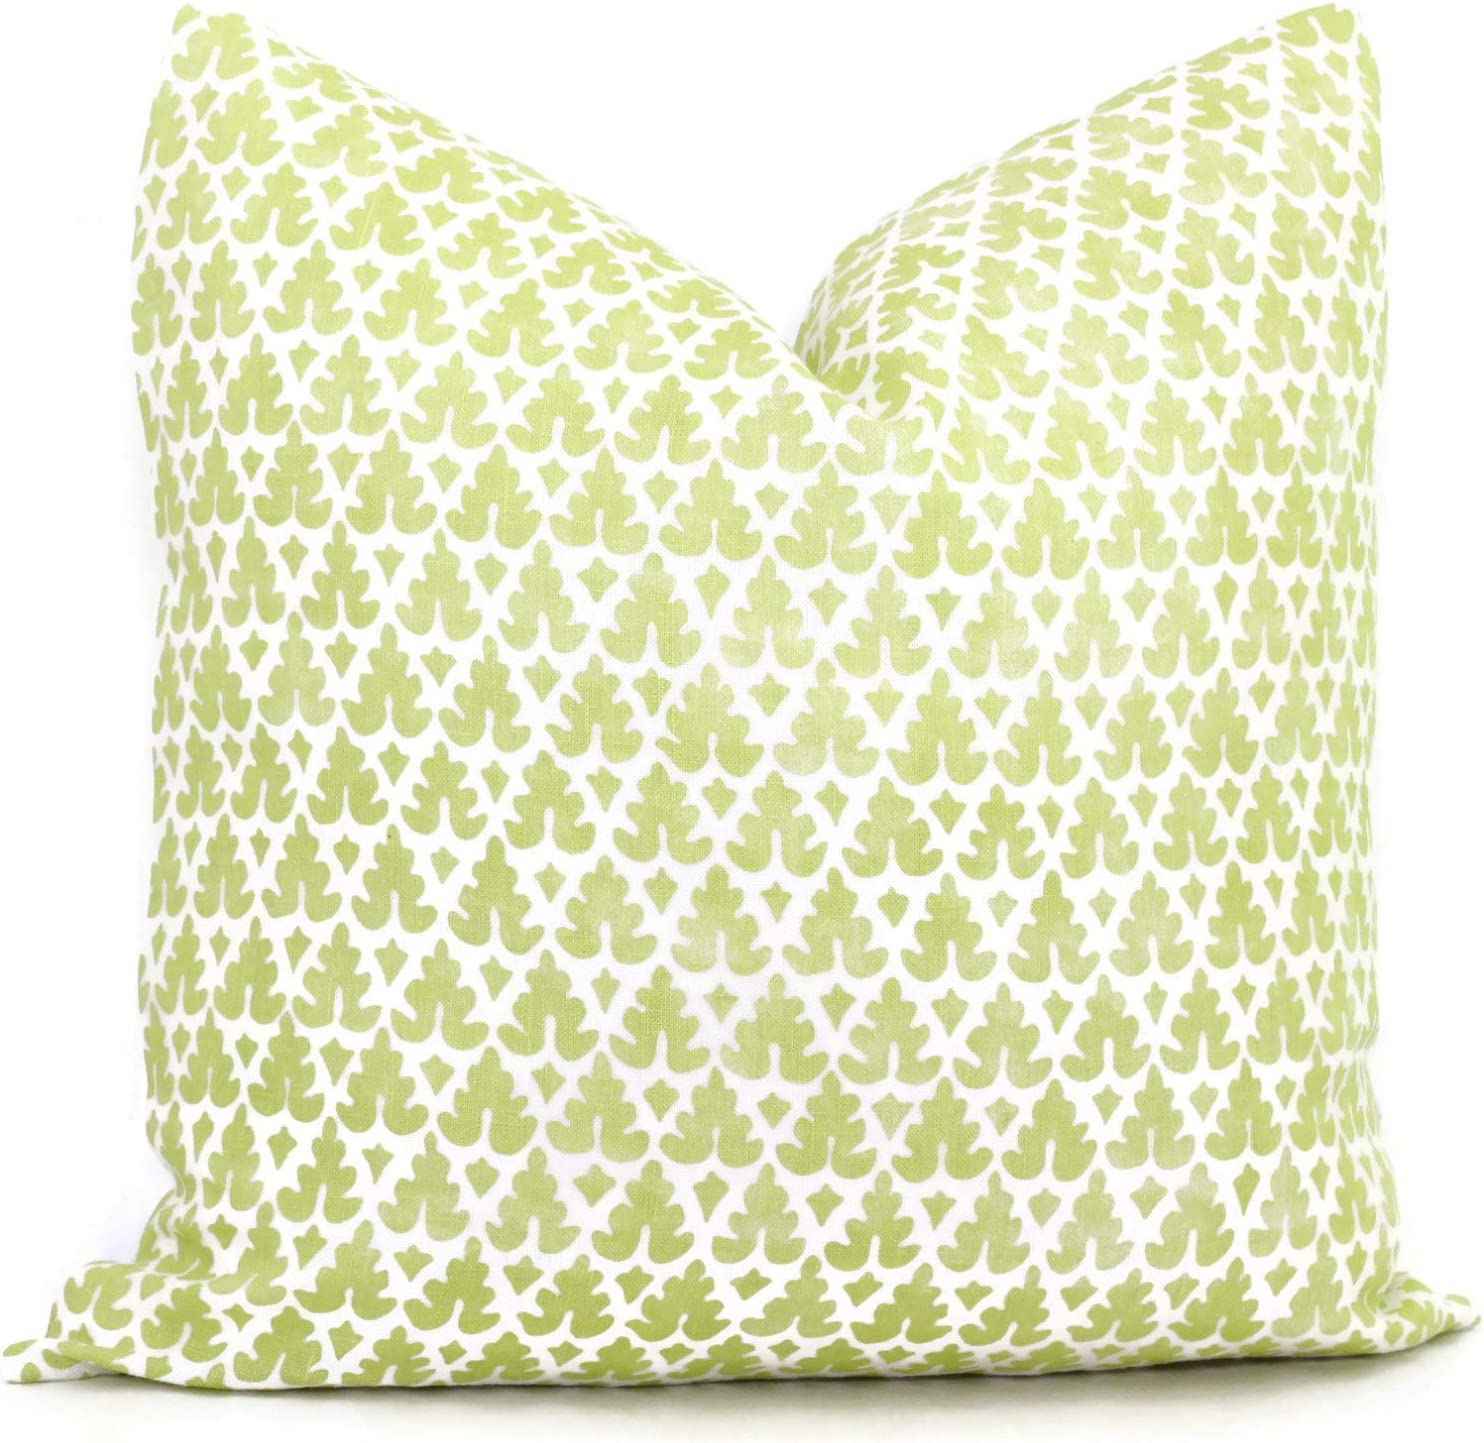 Flowershave357 Quadrille Green Apple Volpi Pillow Cover Square Eurosham Lumbar Pillow Accent Pillow Throw Pillow Greenery Pantone Color toss Pillow